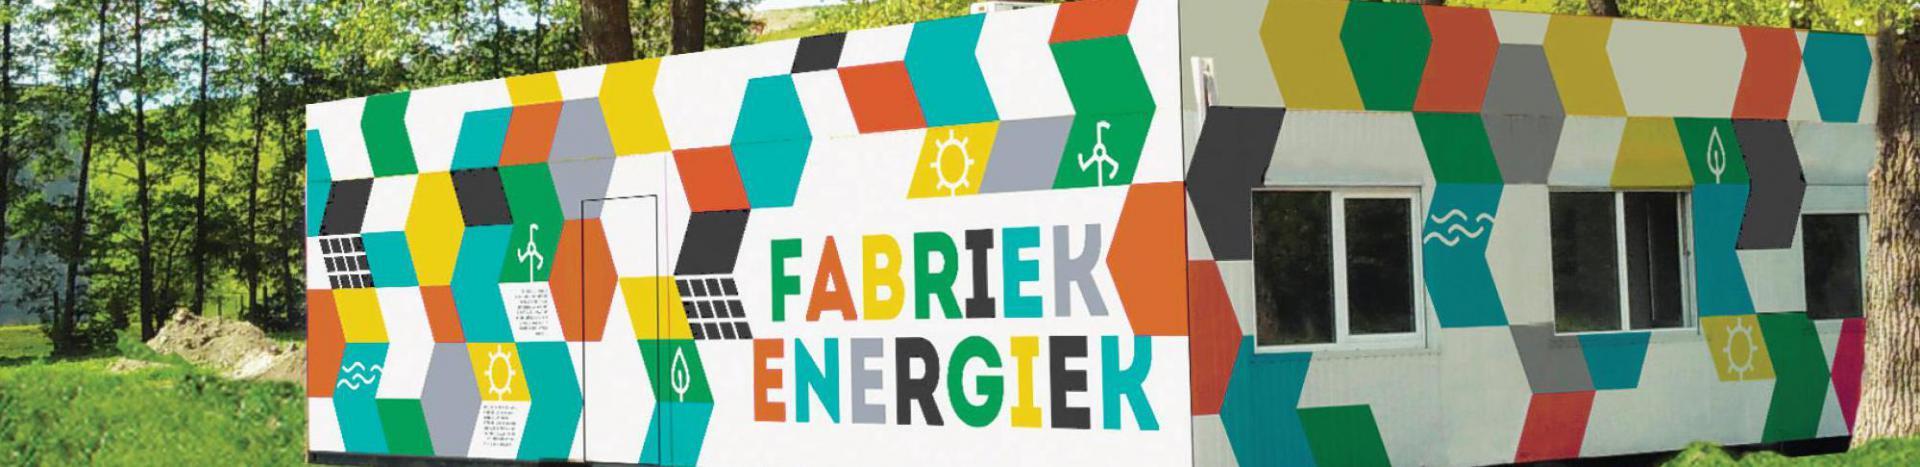 Fabriek Energiek